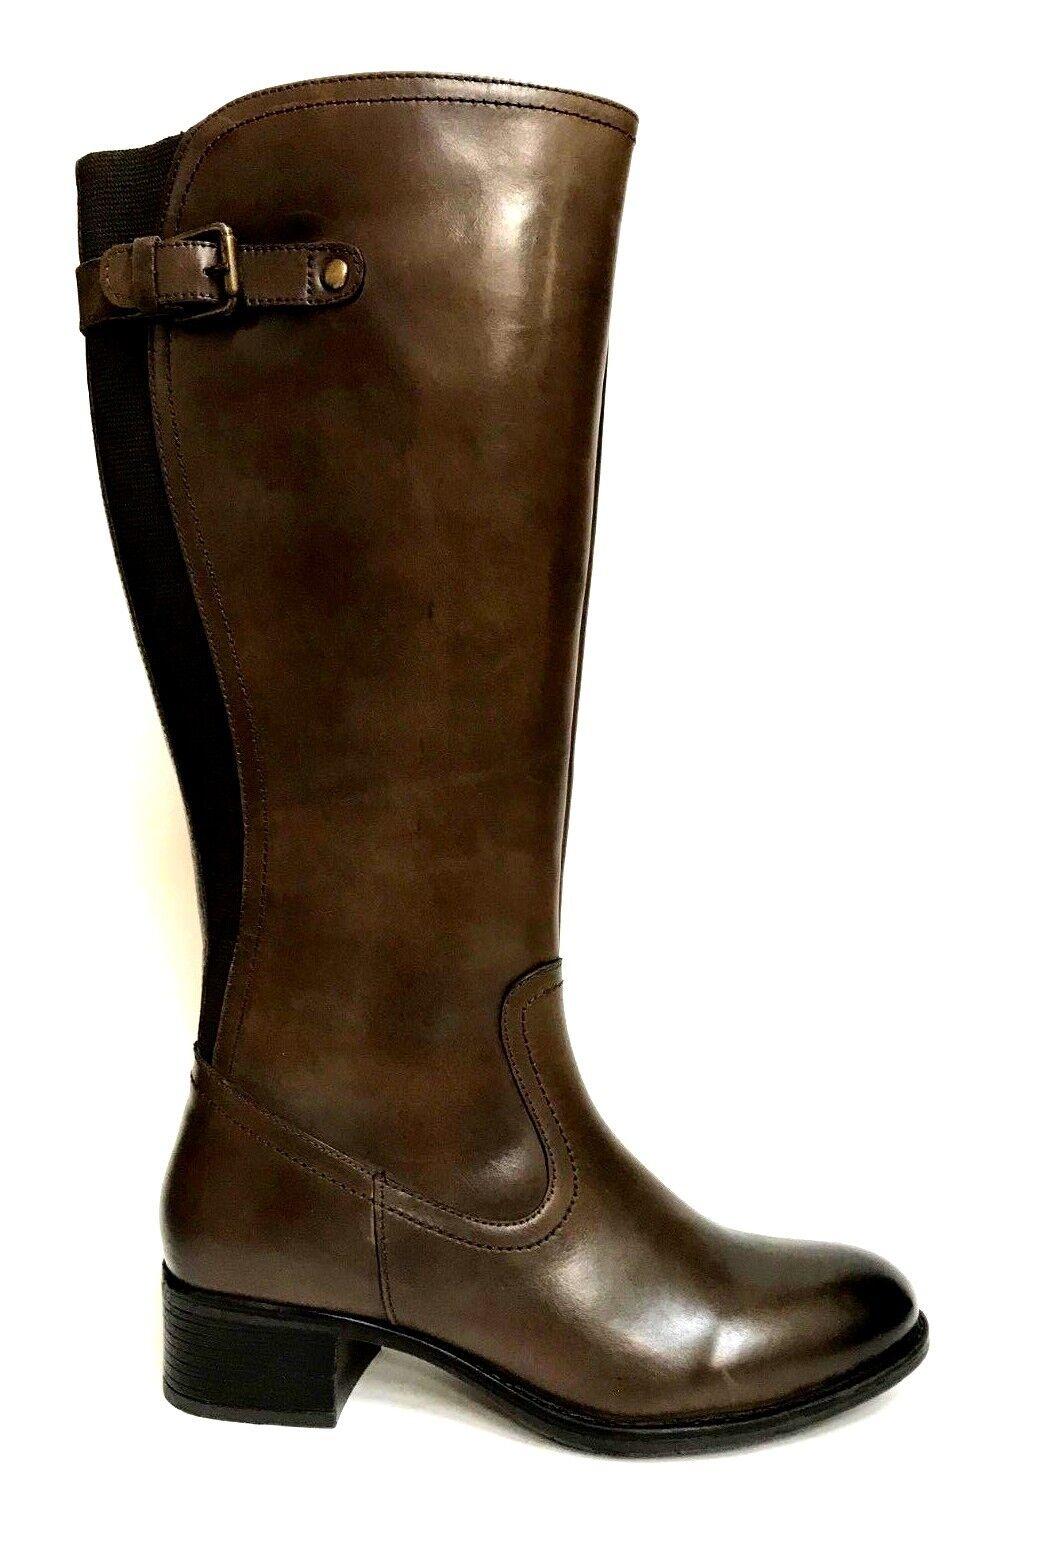 shoes women PREGUNTA SHOES STIVALI 5351 BROWN 100% PELLE INVERNO SCONTO 50%